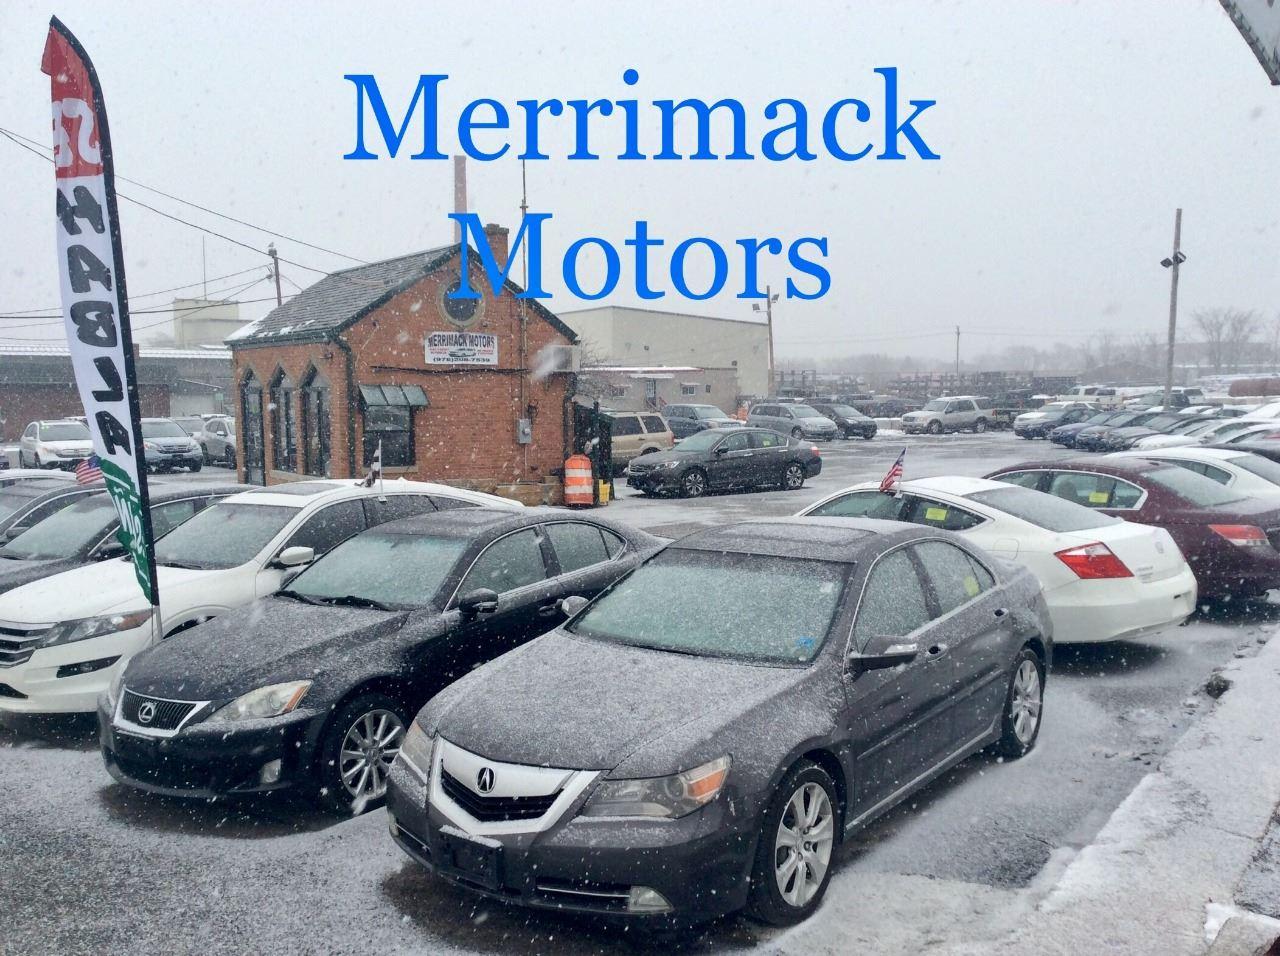 Merrimack Motors